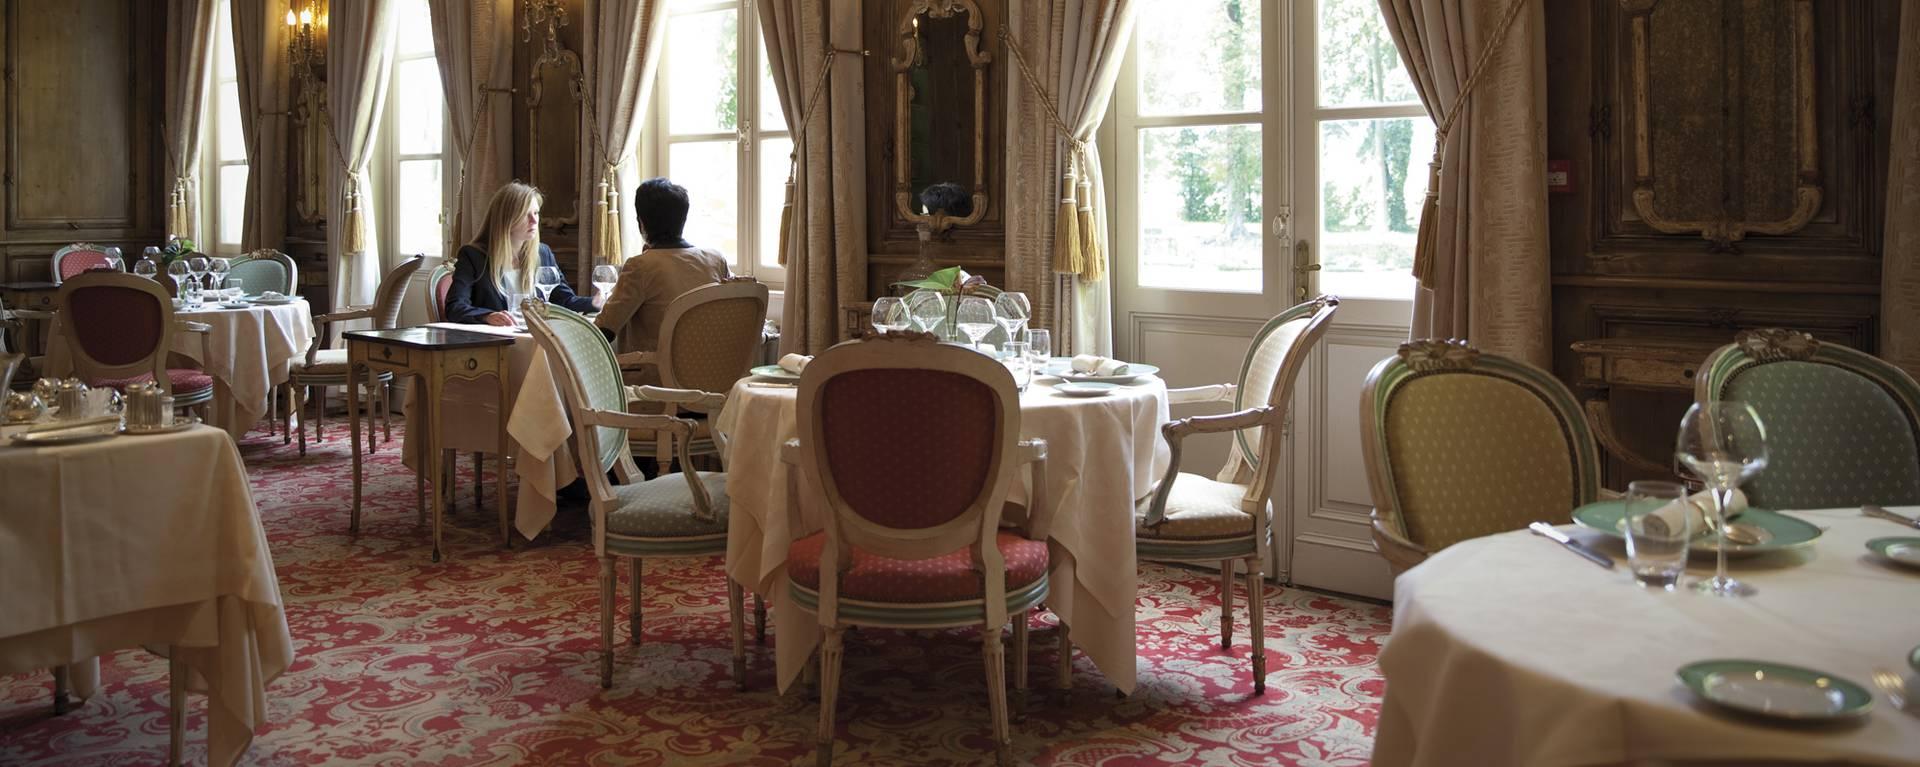 Restaurant gastronomique Le Robert II © Brigitte Baudesson